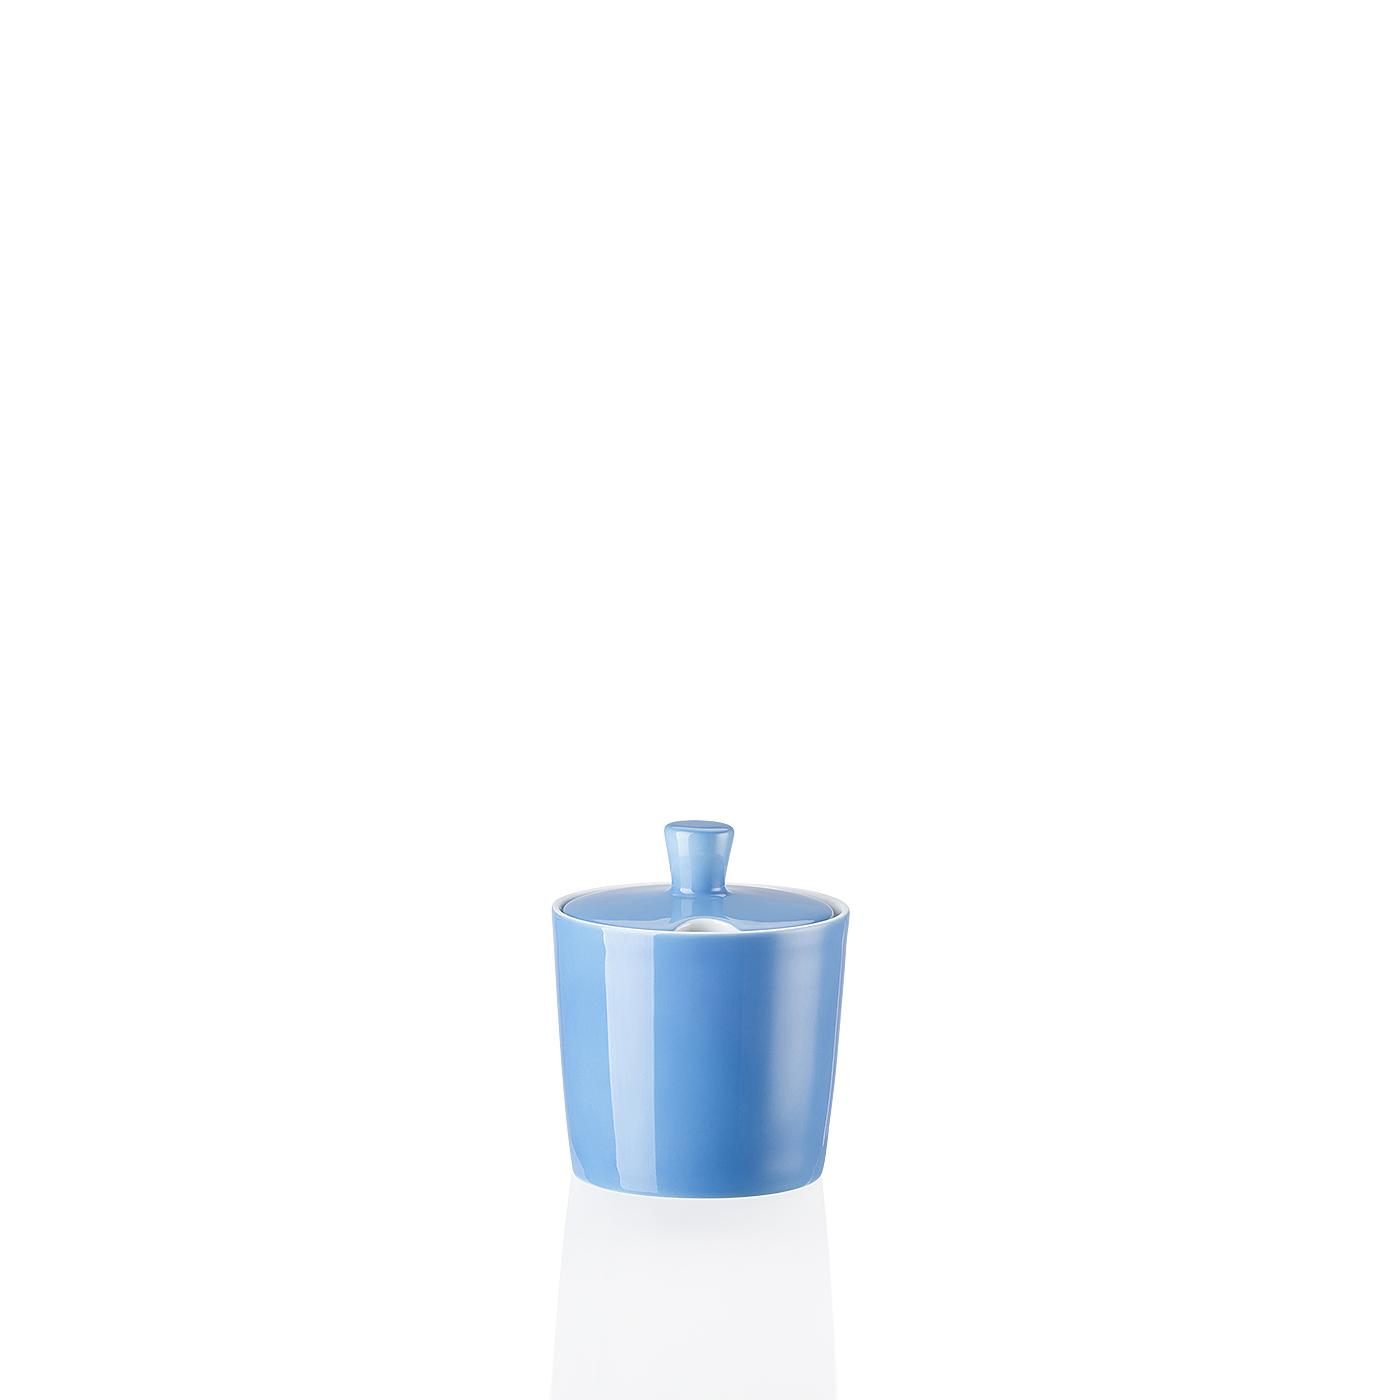 Zucker-/Marmeladendose 6 P. Tric Blau Arzberg